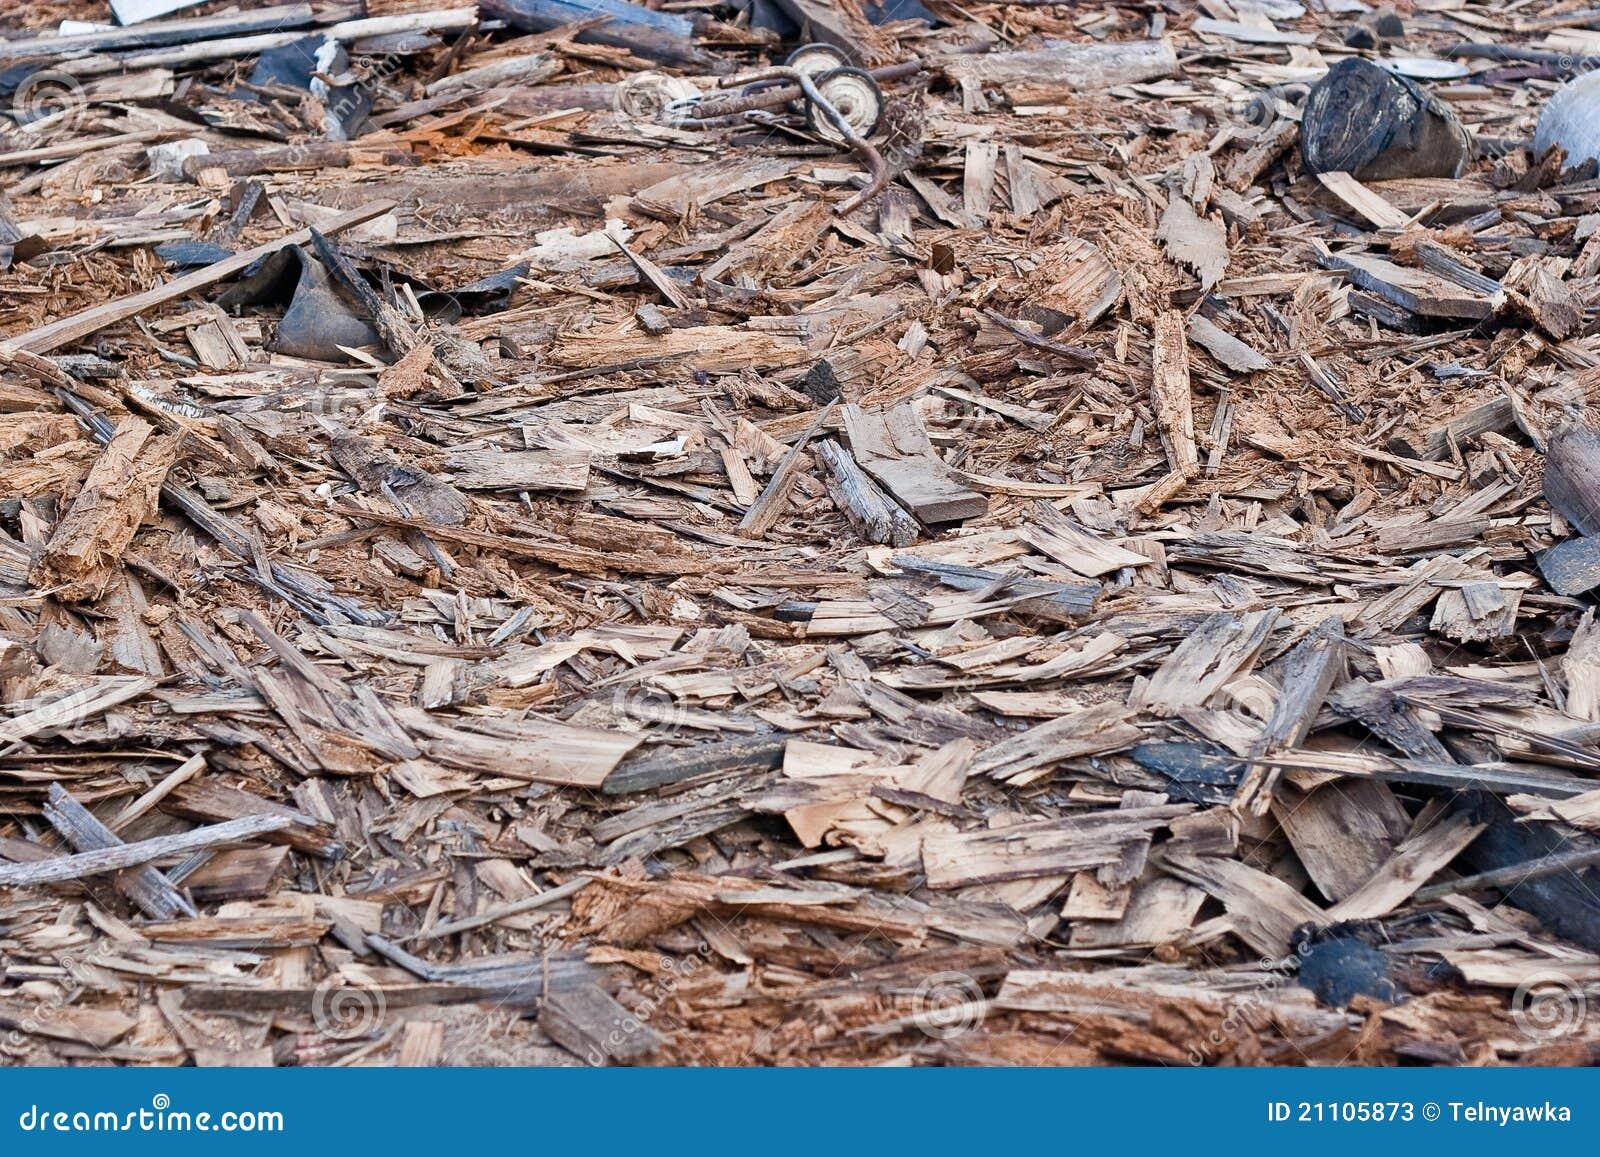 Pile Of Building Debris : A pile of debris stock photos image